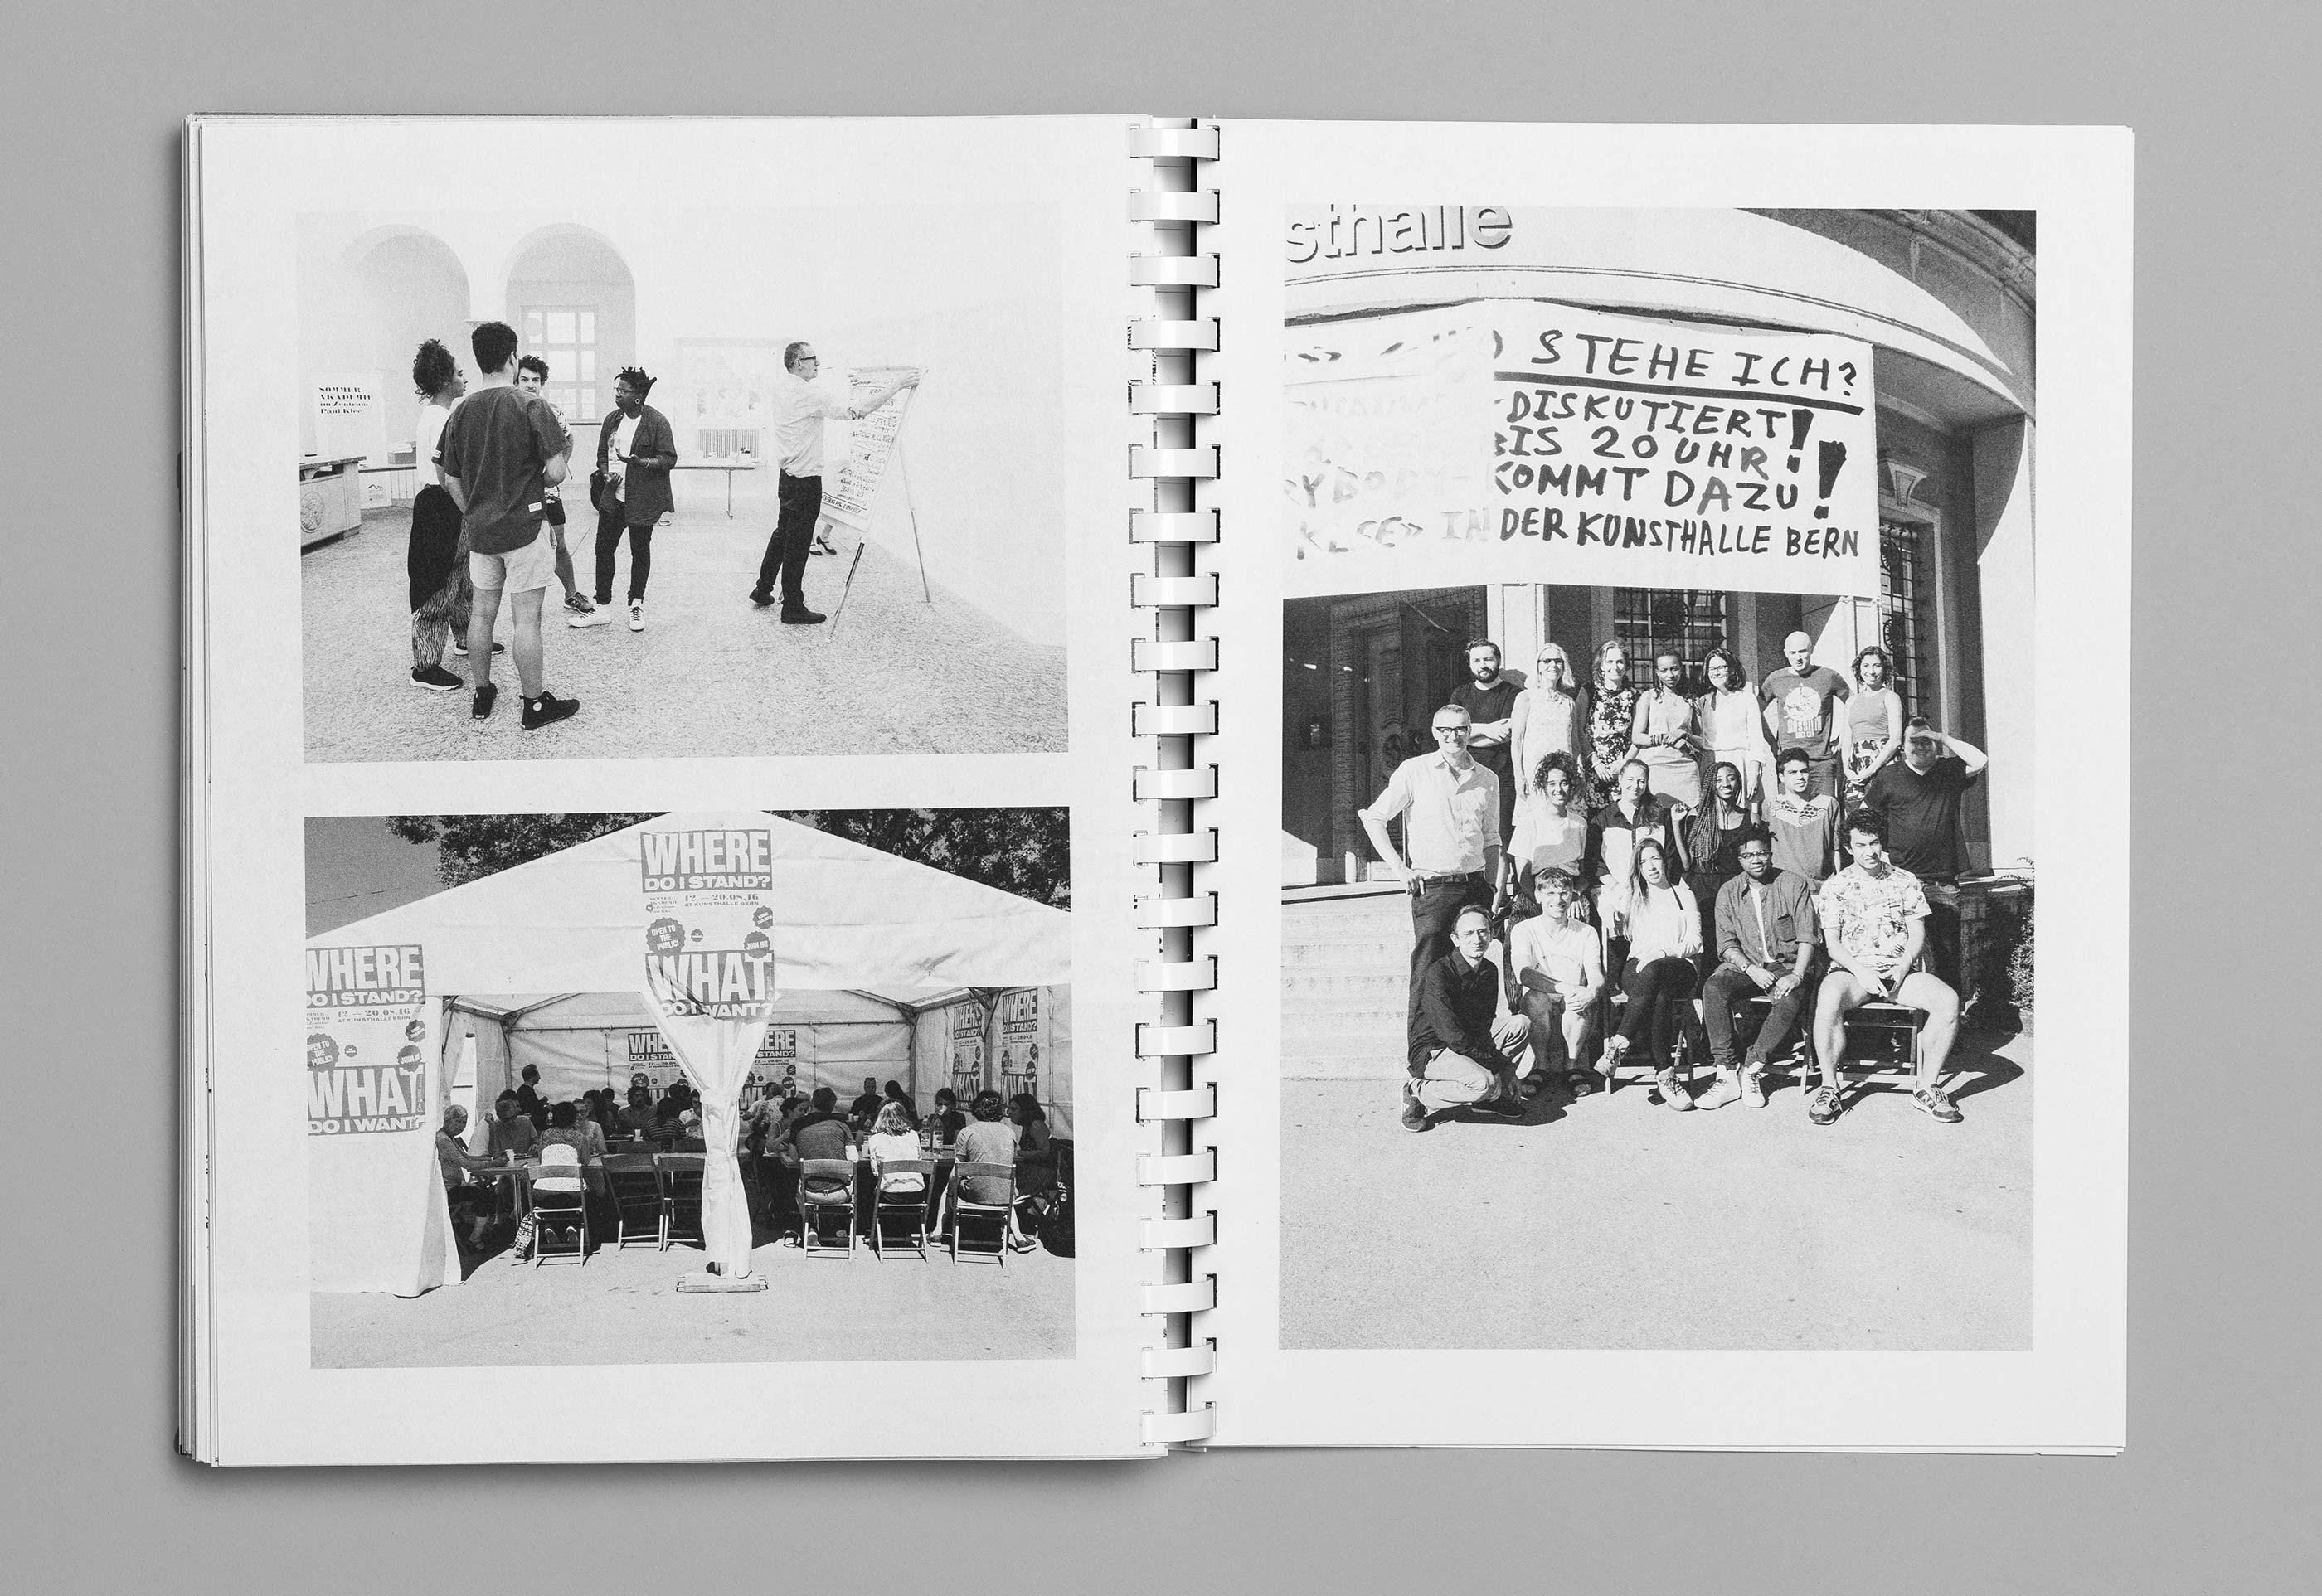 Sommerakademie im Zentrum Paul Klee 2016 – Publikation Thomas Hirschhorn, 14  ©Atelier Pol